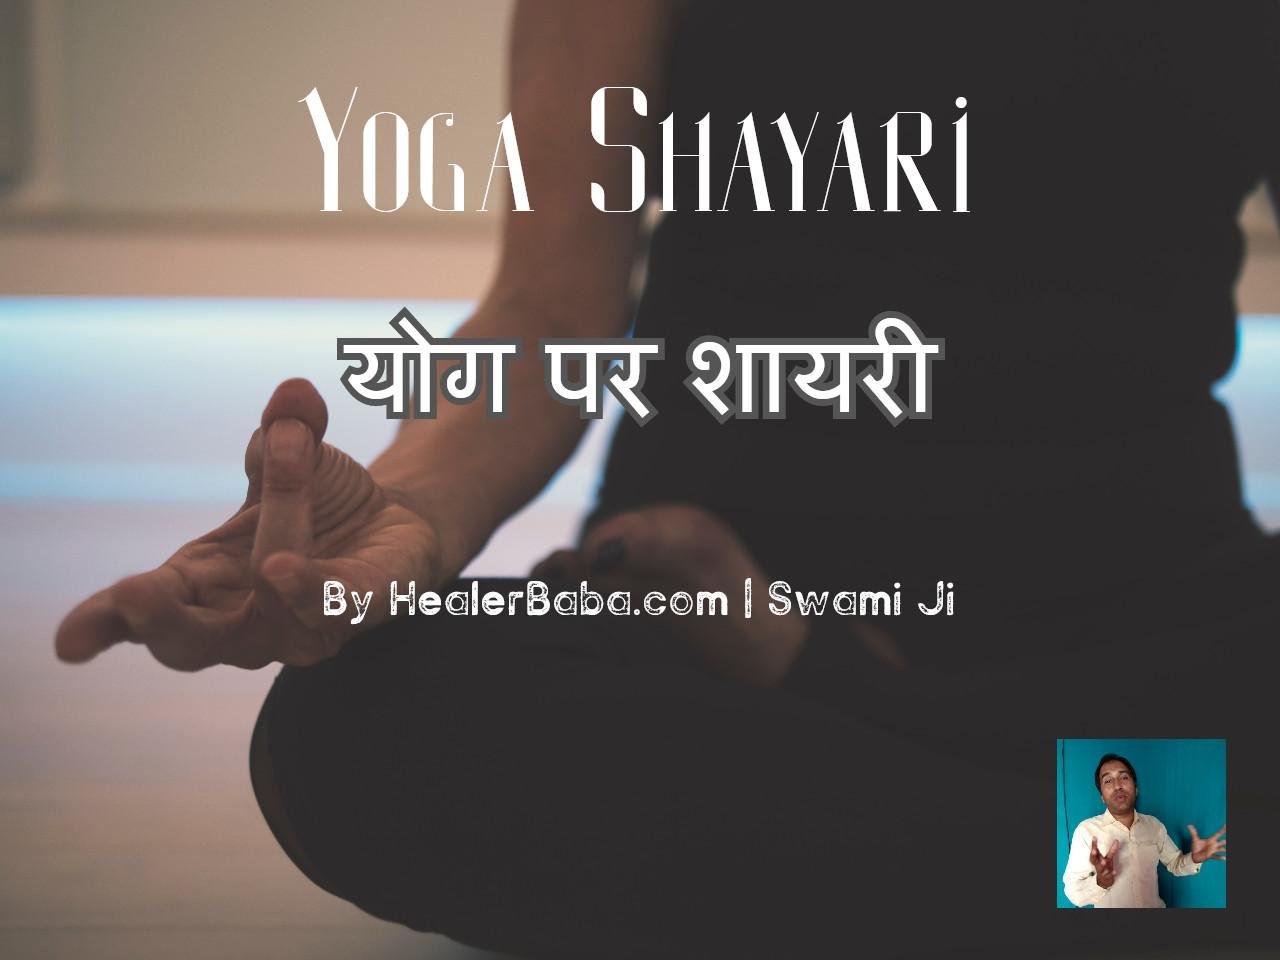 Yoga Shayari | योग पर शायरी